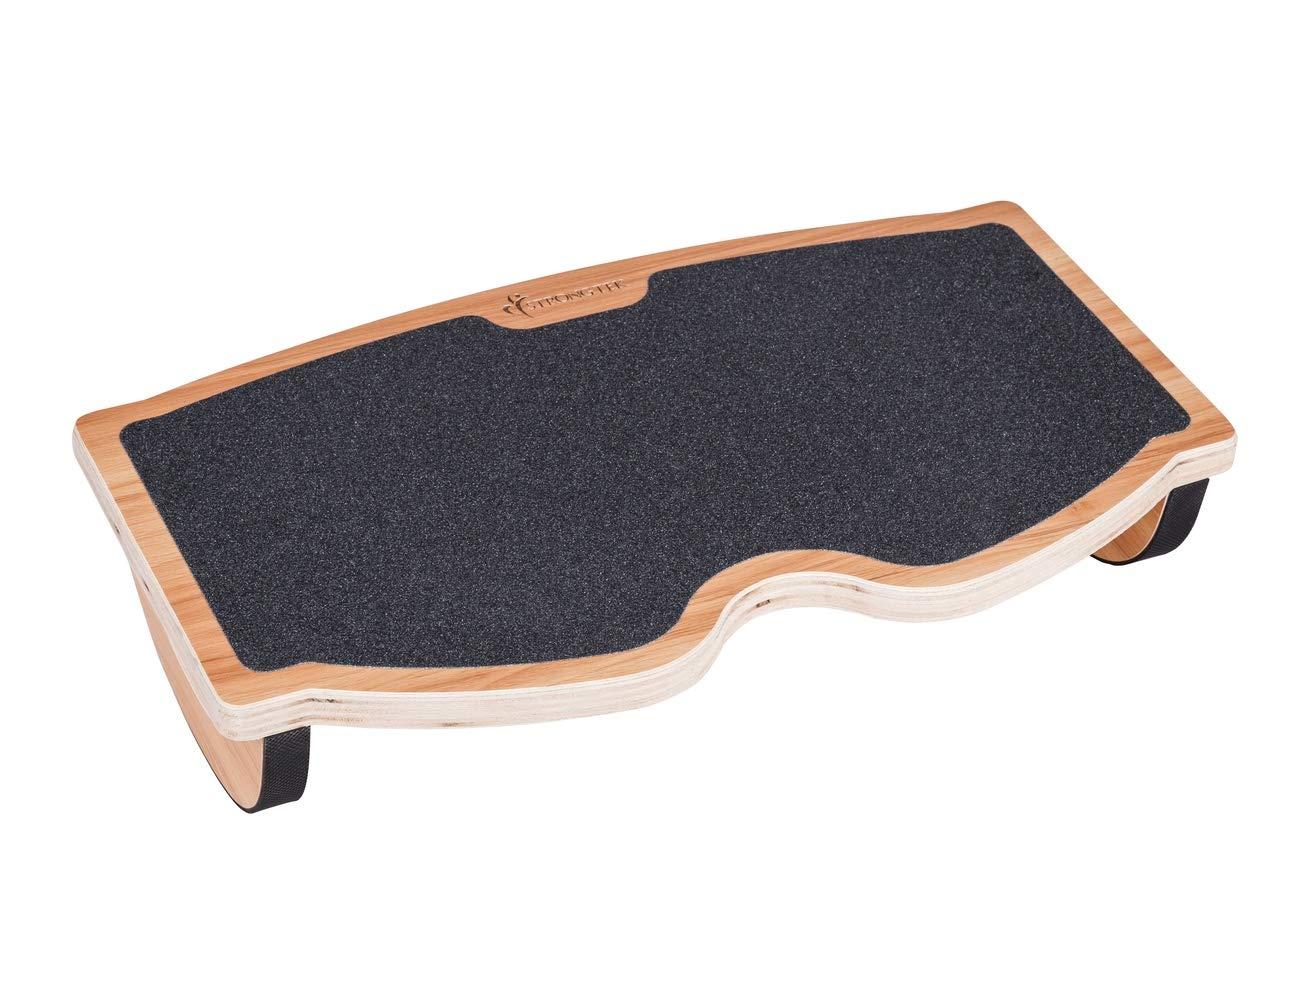 StrongTek Foot Rest Rocker Under Desk, Rocking Step Stool, Balance Board | Natural Wood, Non-Slip | Ergonomic Pressure Relief for Proper Posture Support | Home, Office and PC Use (350LB Capacity)